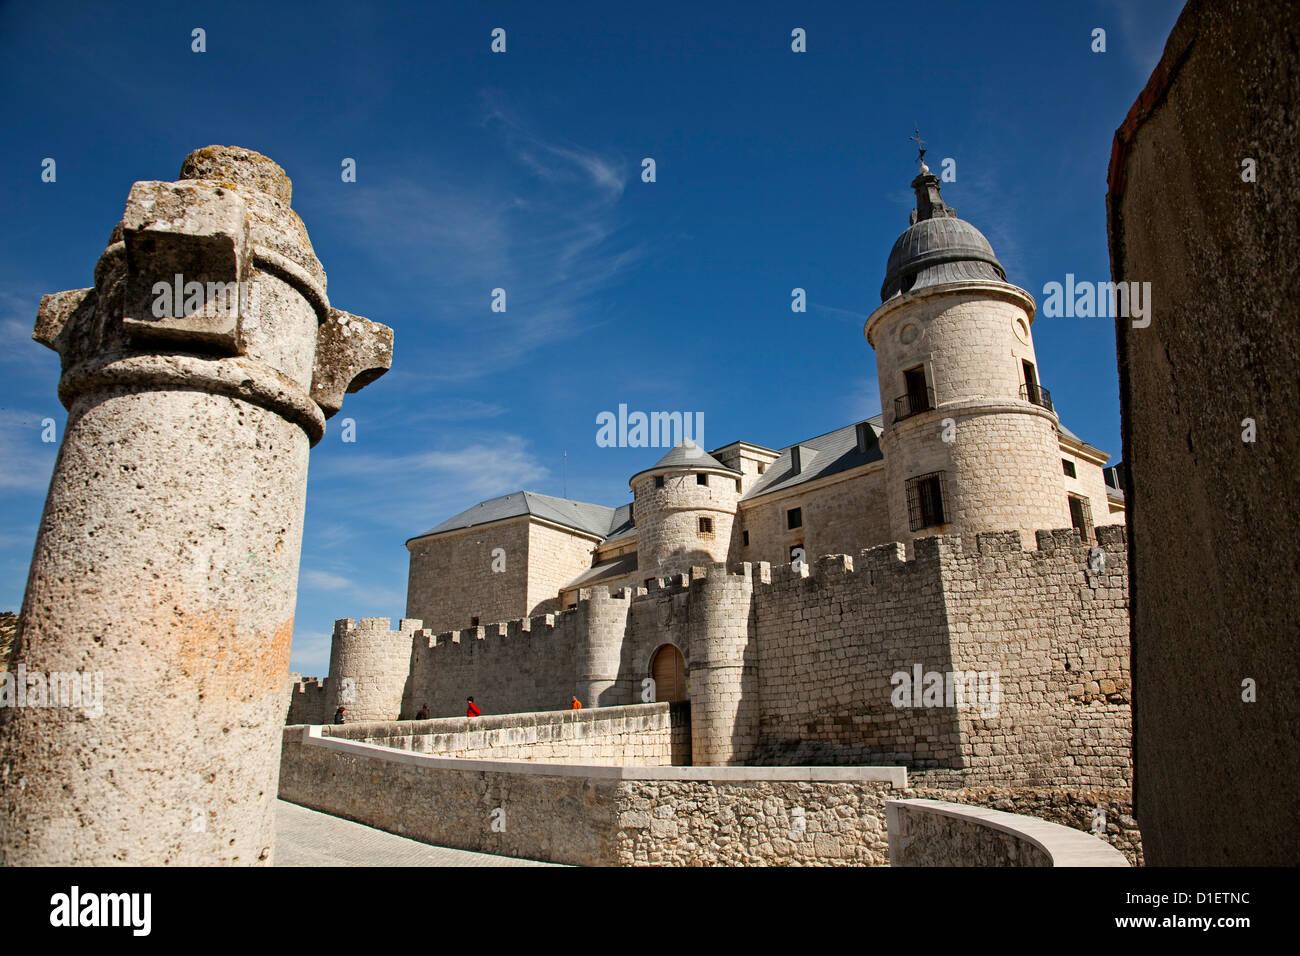 Castle Historical Archive Simancas Valladolid Castilla Leon Spain - Stock Image